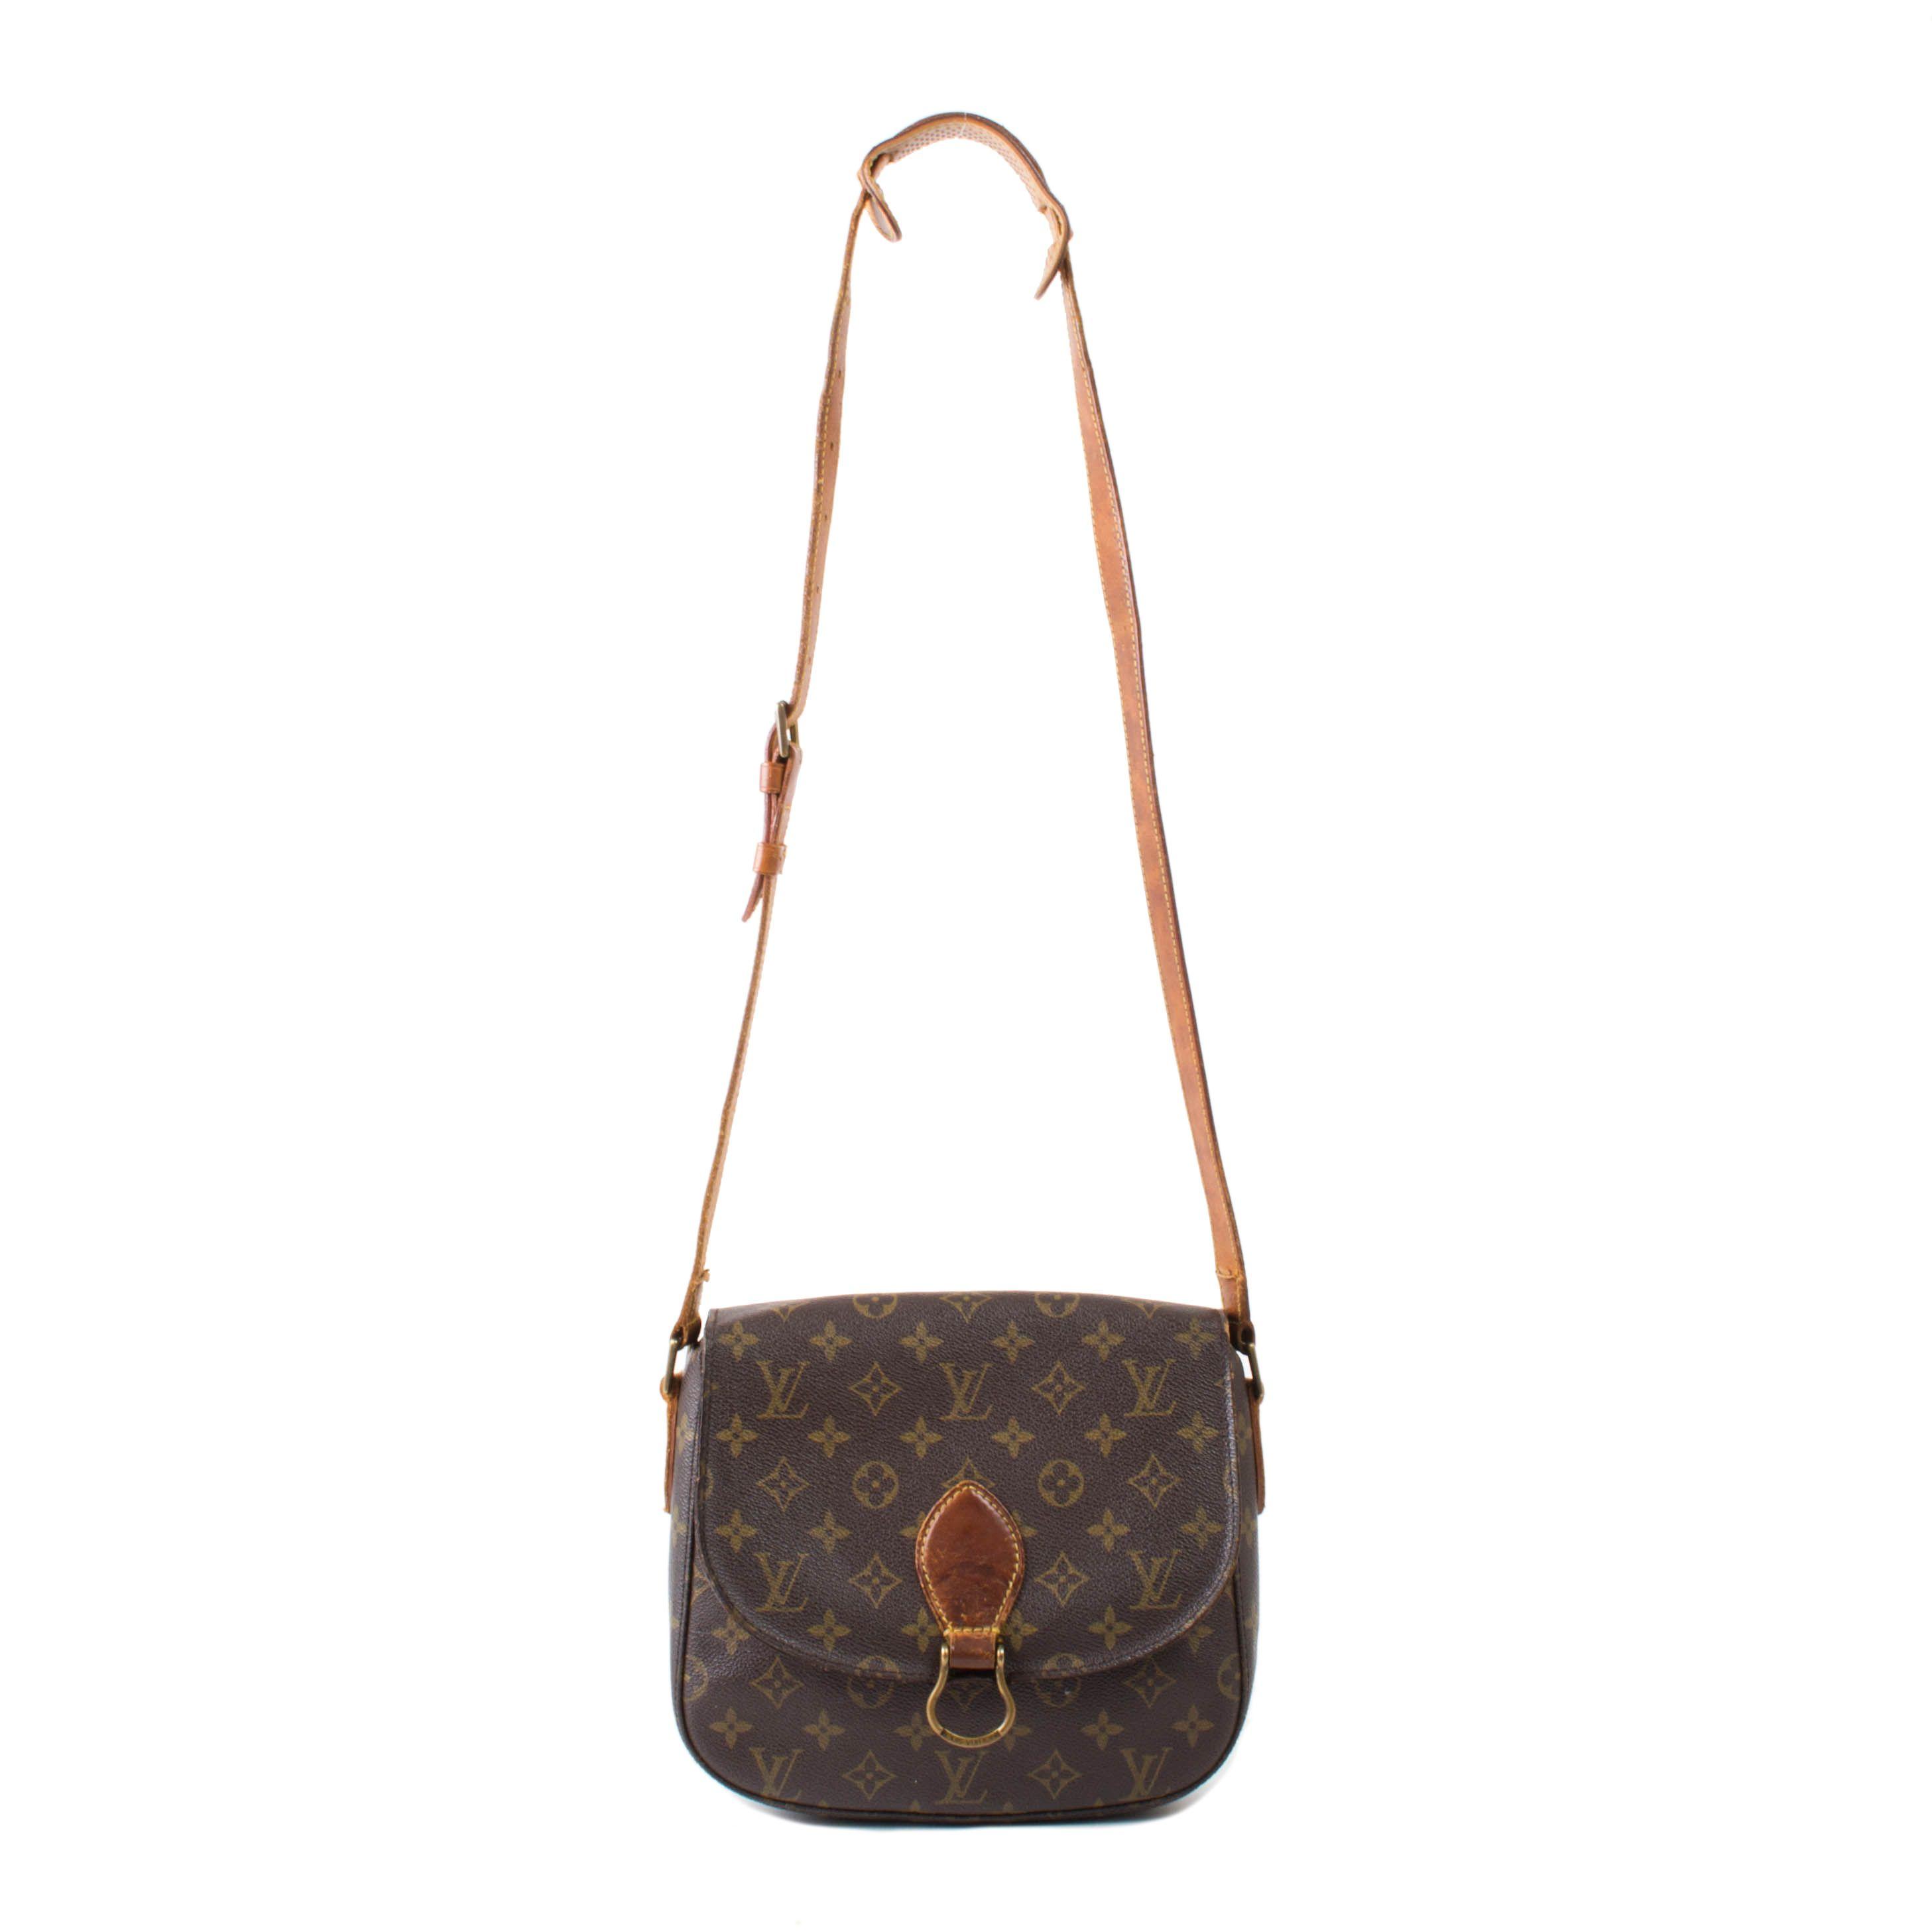 Home Lxr Co Sling Bag Bags Handbag Accessories